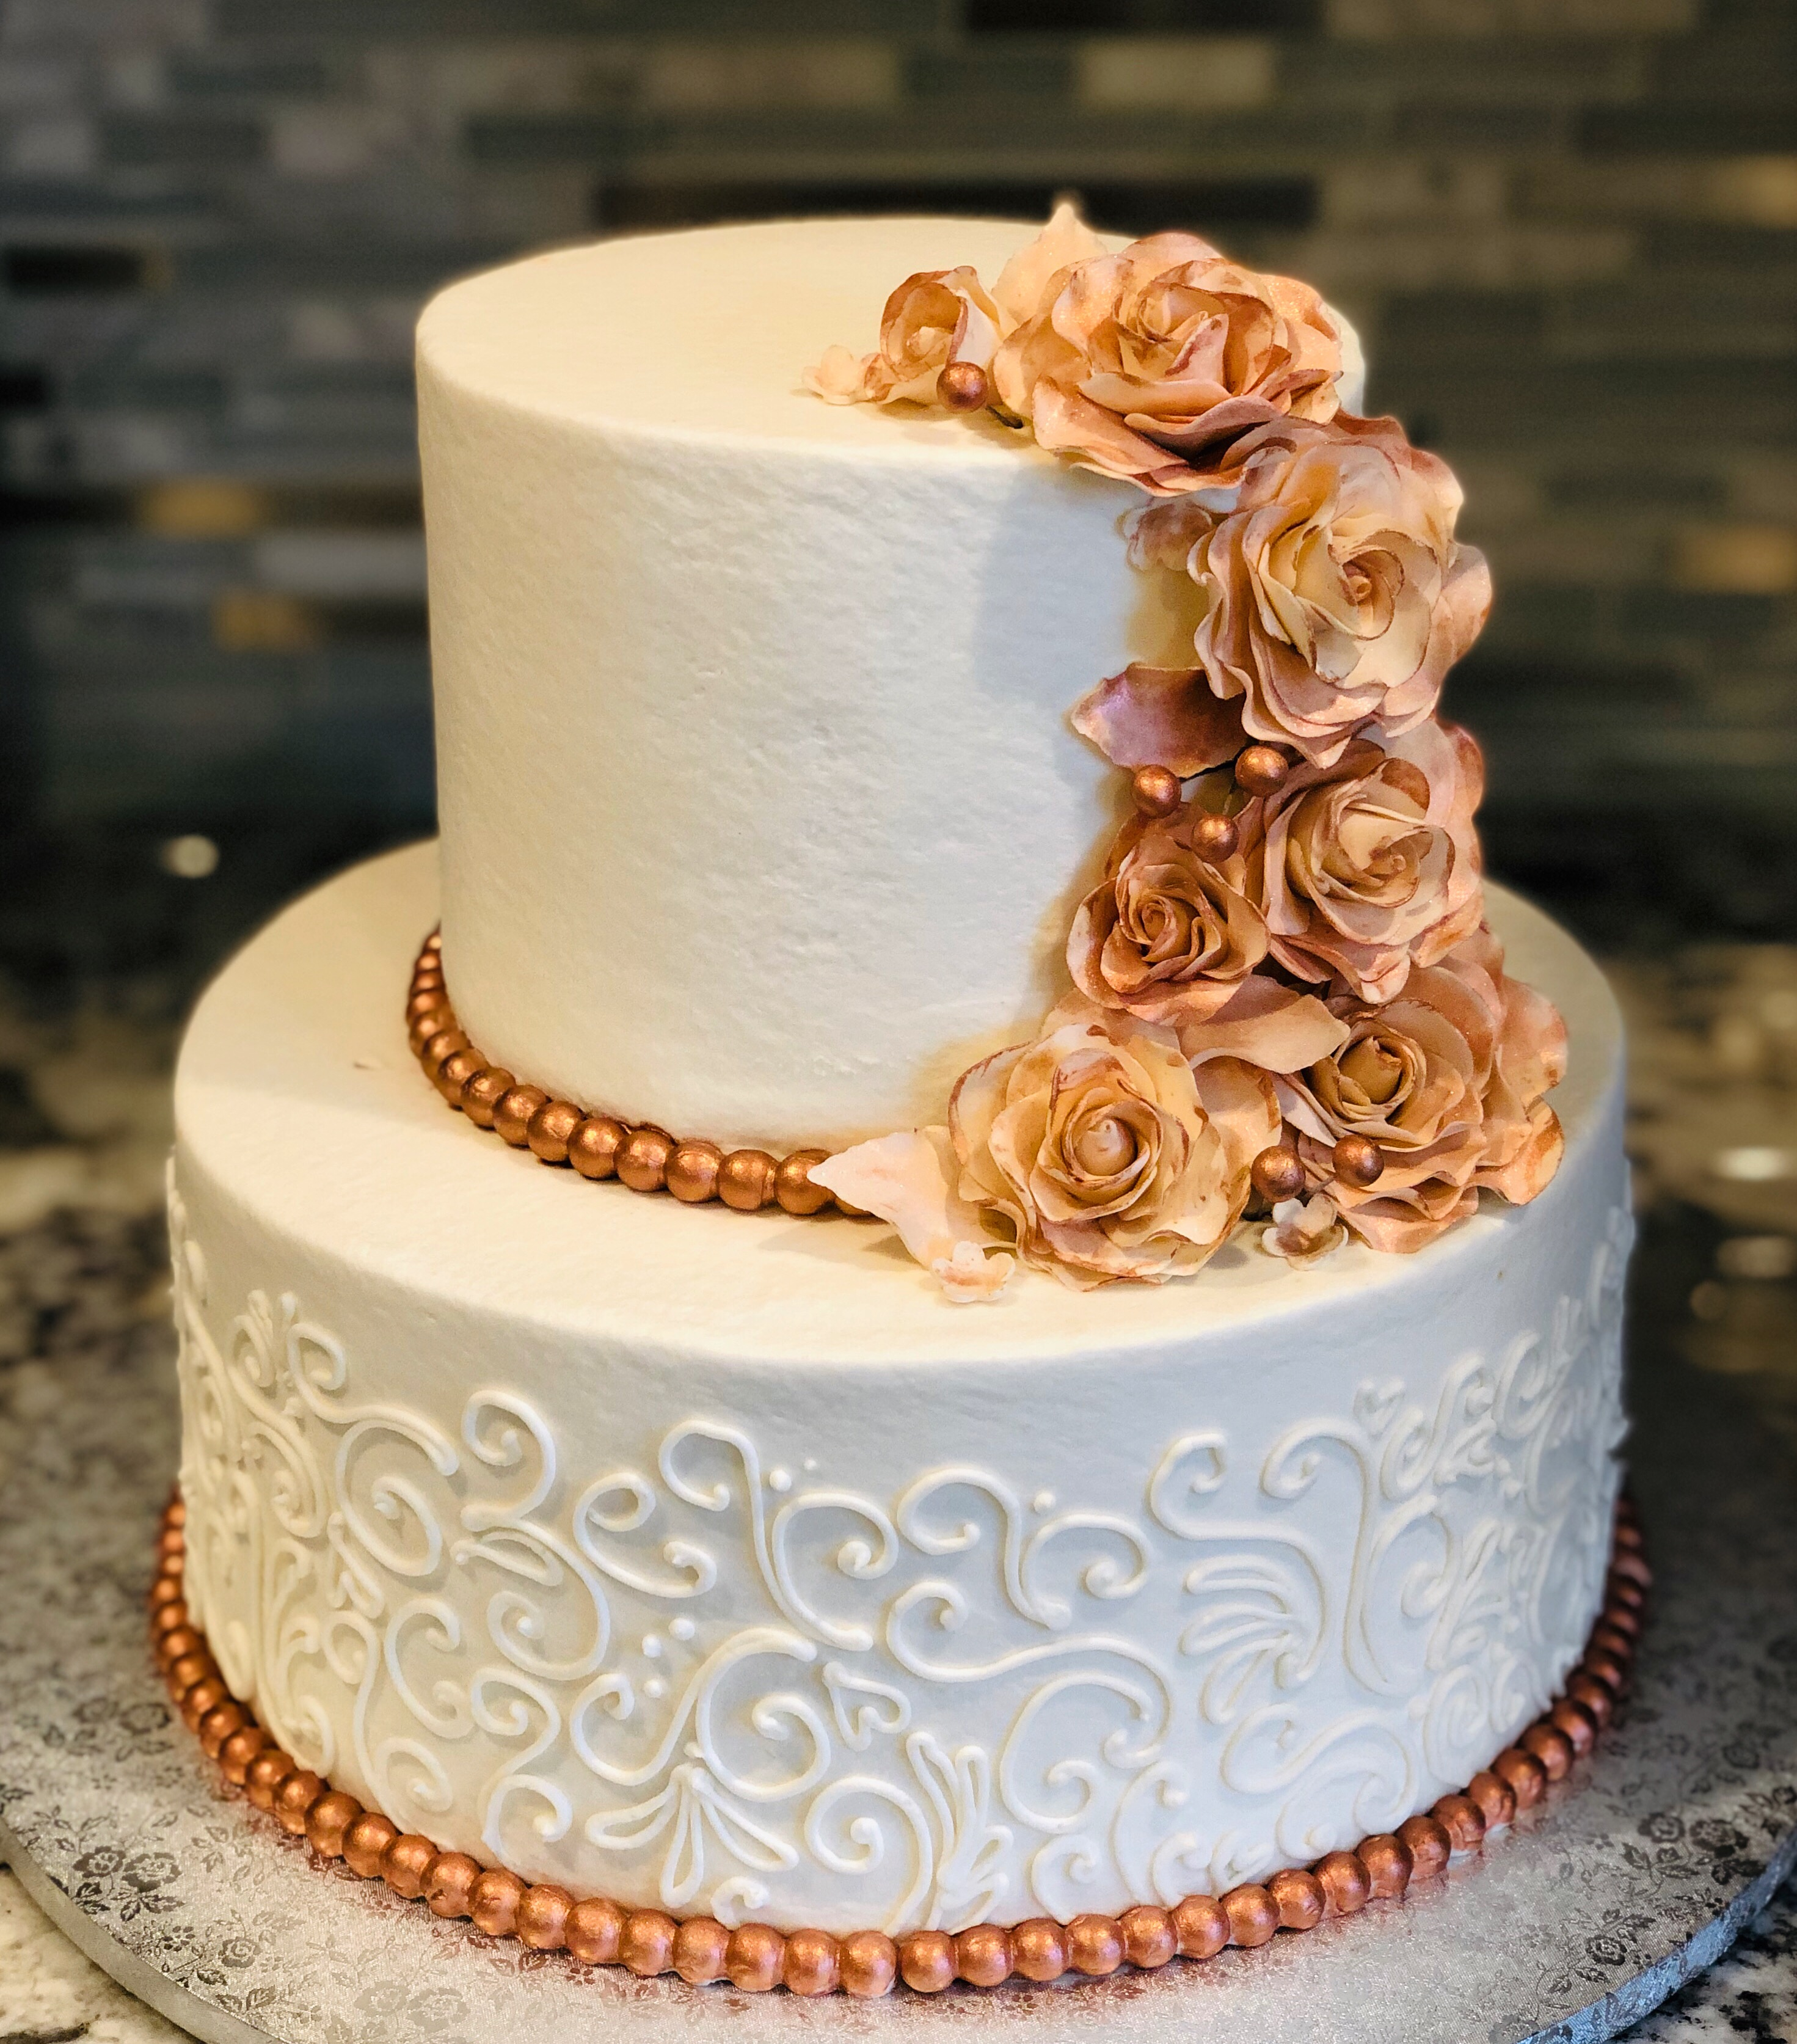 Buttercream scrolls and rose gold sugar roses